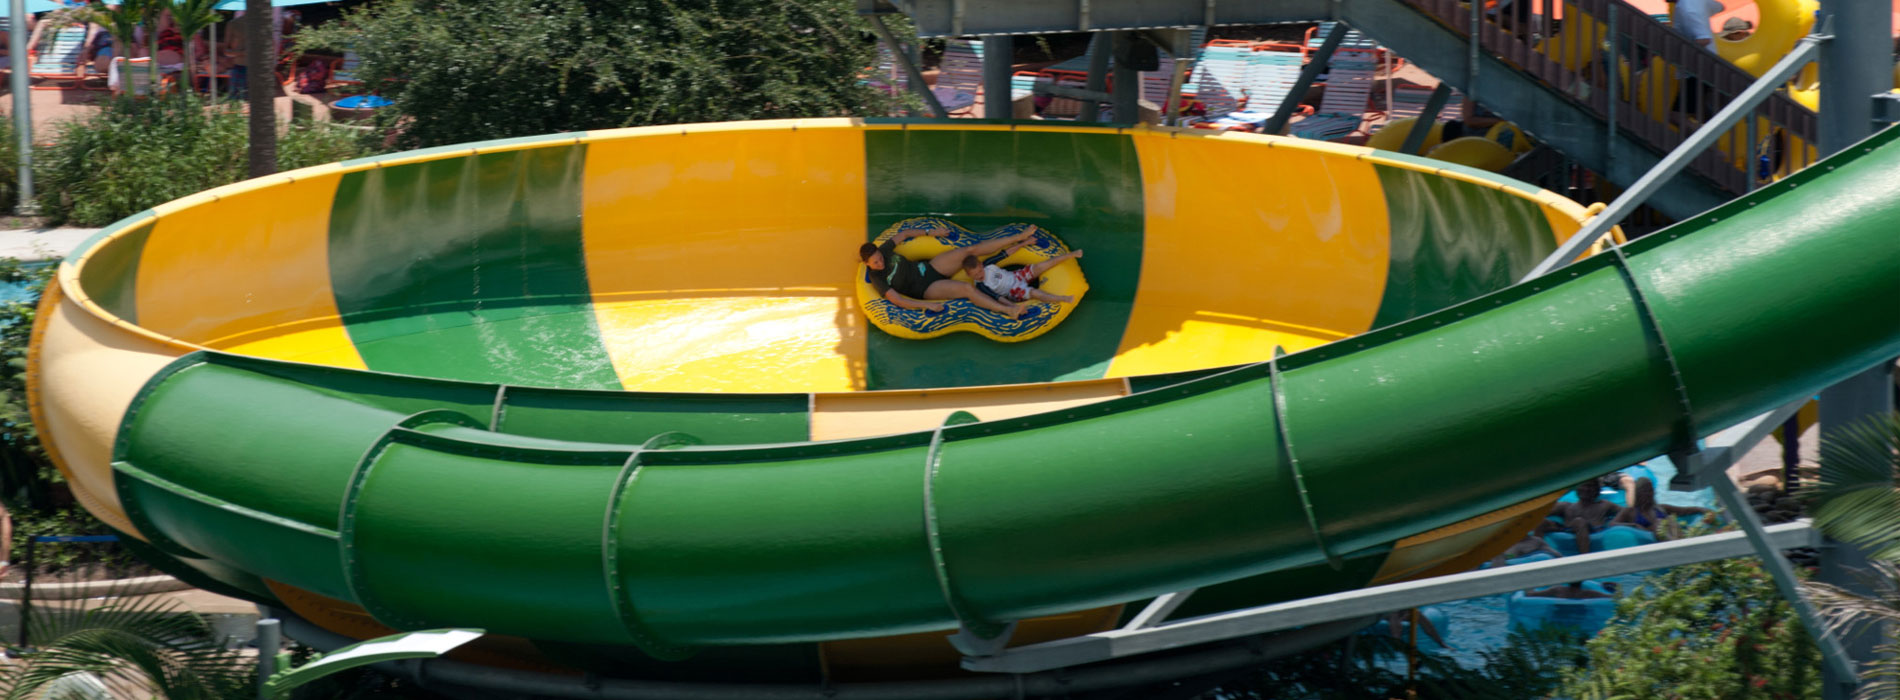 Twist and slide on Tassie's Twisters at Aquatica